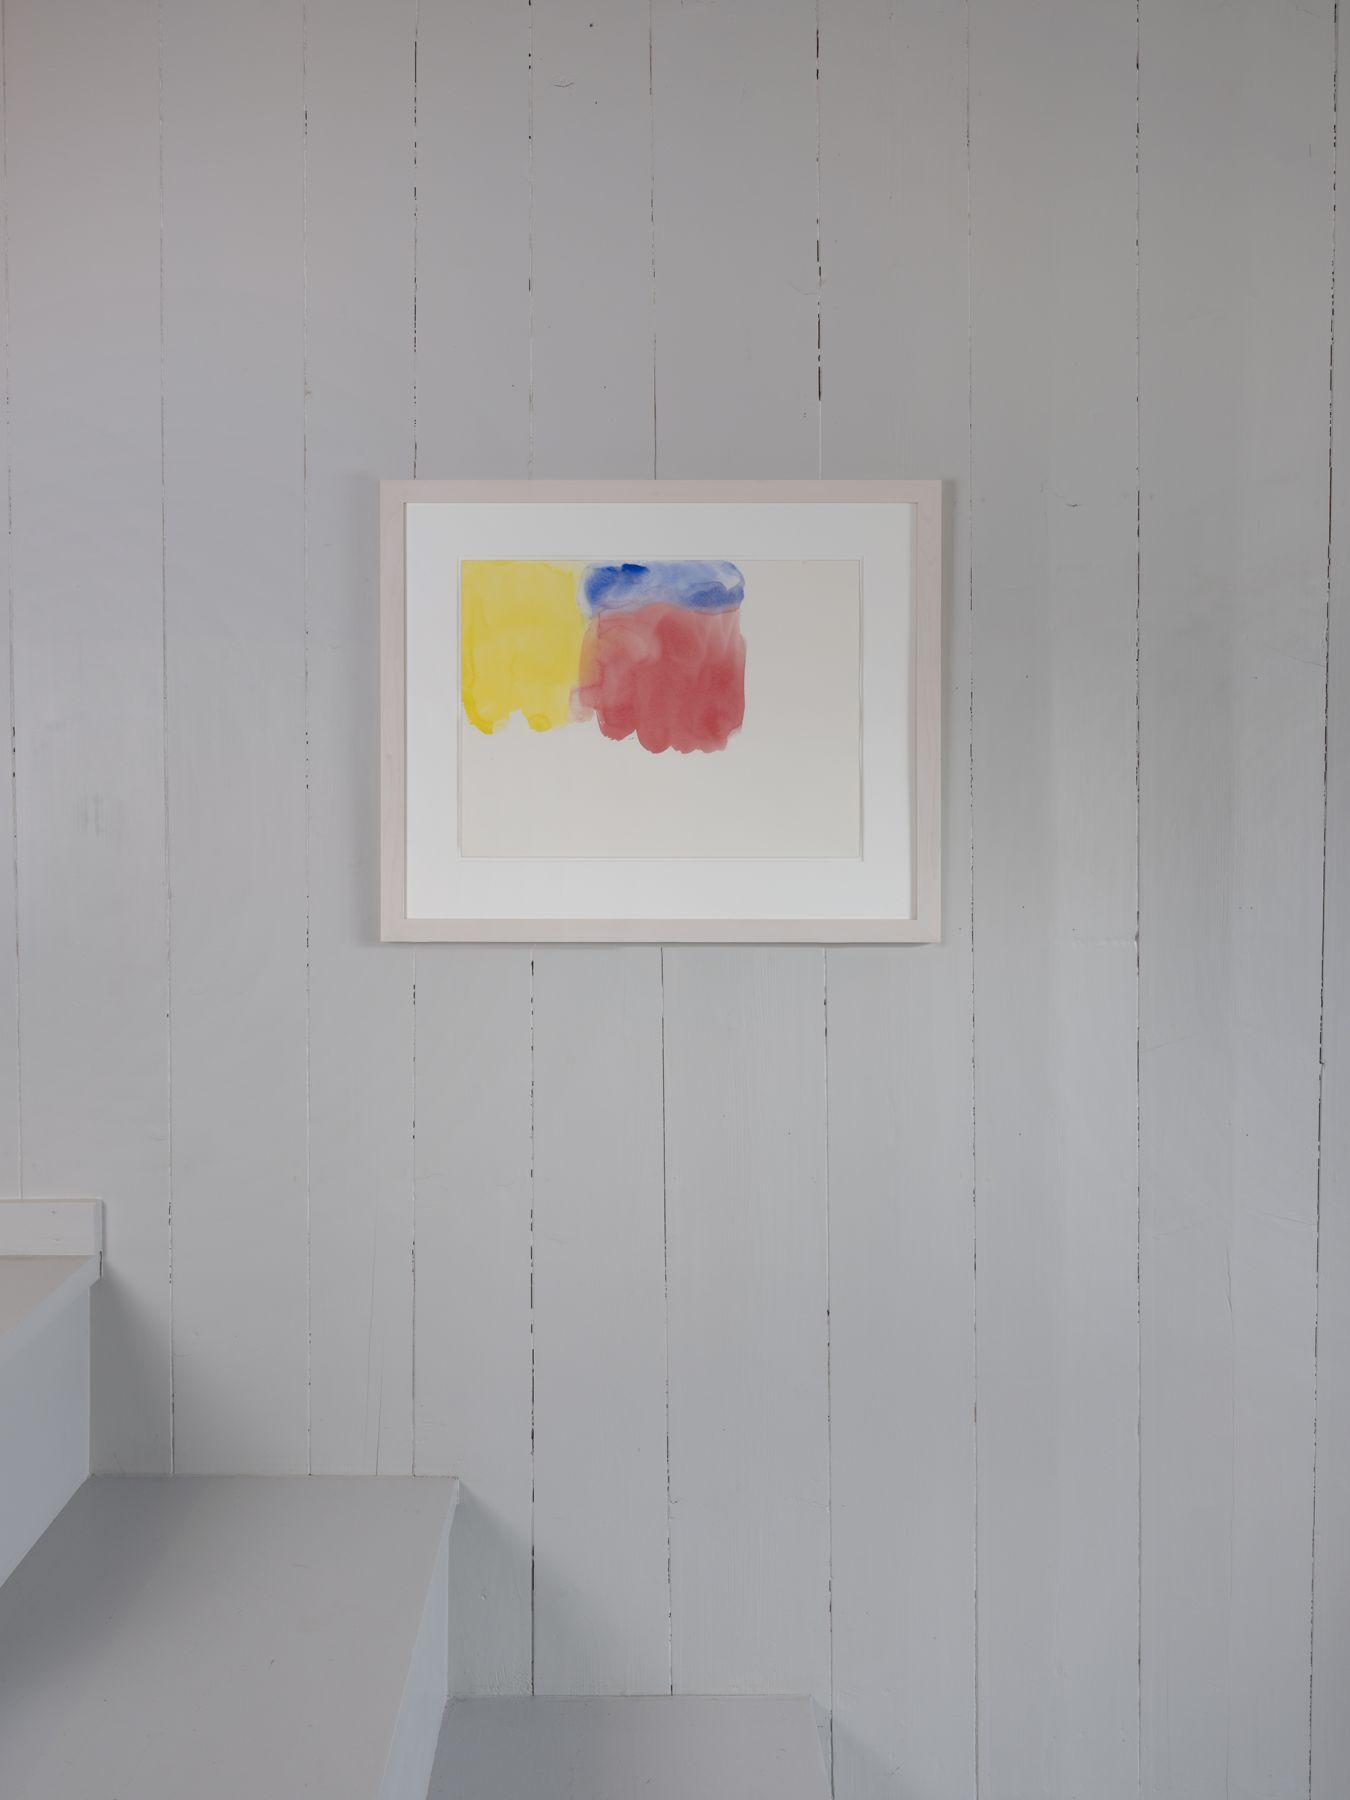 Markus Döbeli  Untitled, 2015  Watercolor on paper  46 x 61 cm  Installation View, OFFSITE: CHALET, Rossinière, Switzerland | Image © Julien Gremaud